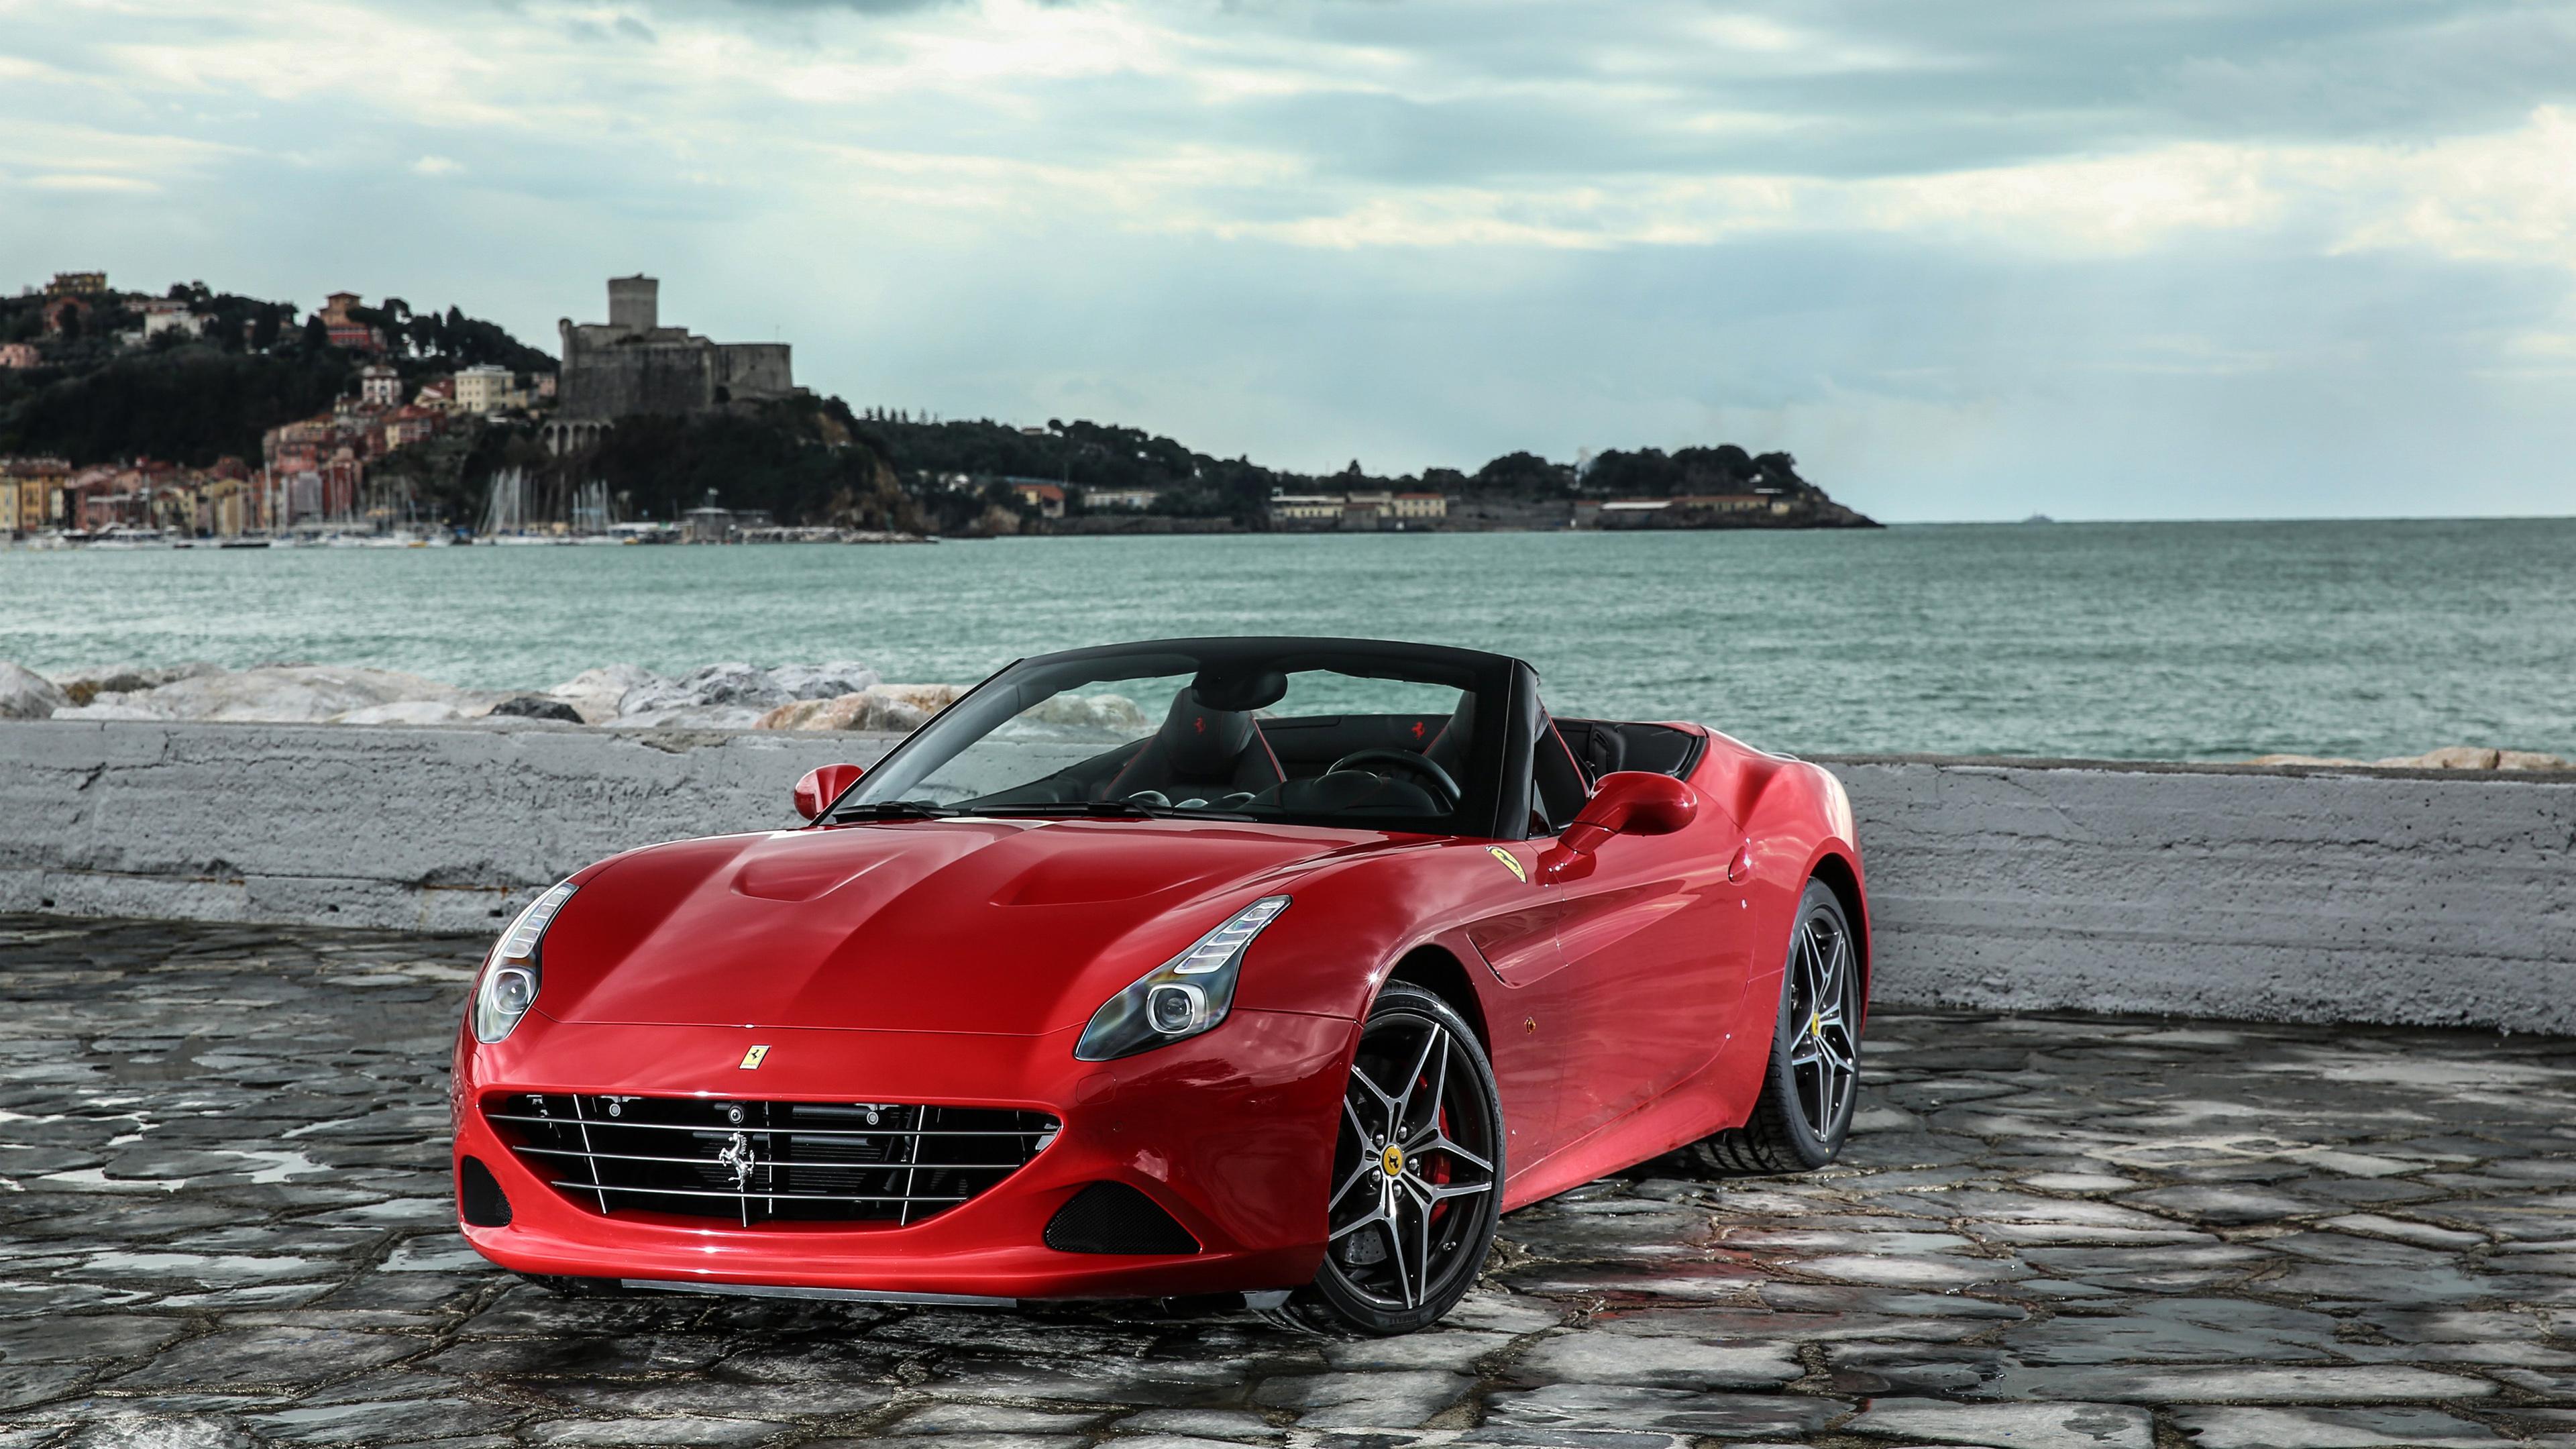 Ferrari 458 Italia Wallpaper Hd 2016 Ferrari California T Hs Wallpaper Hd Car Wallpapers